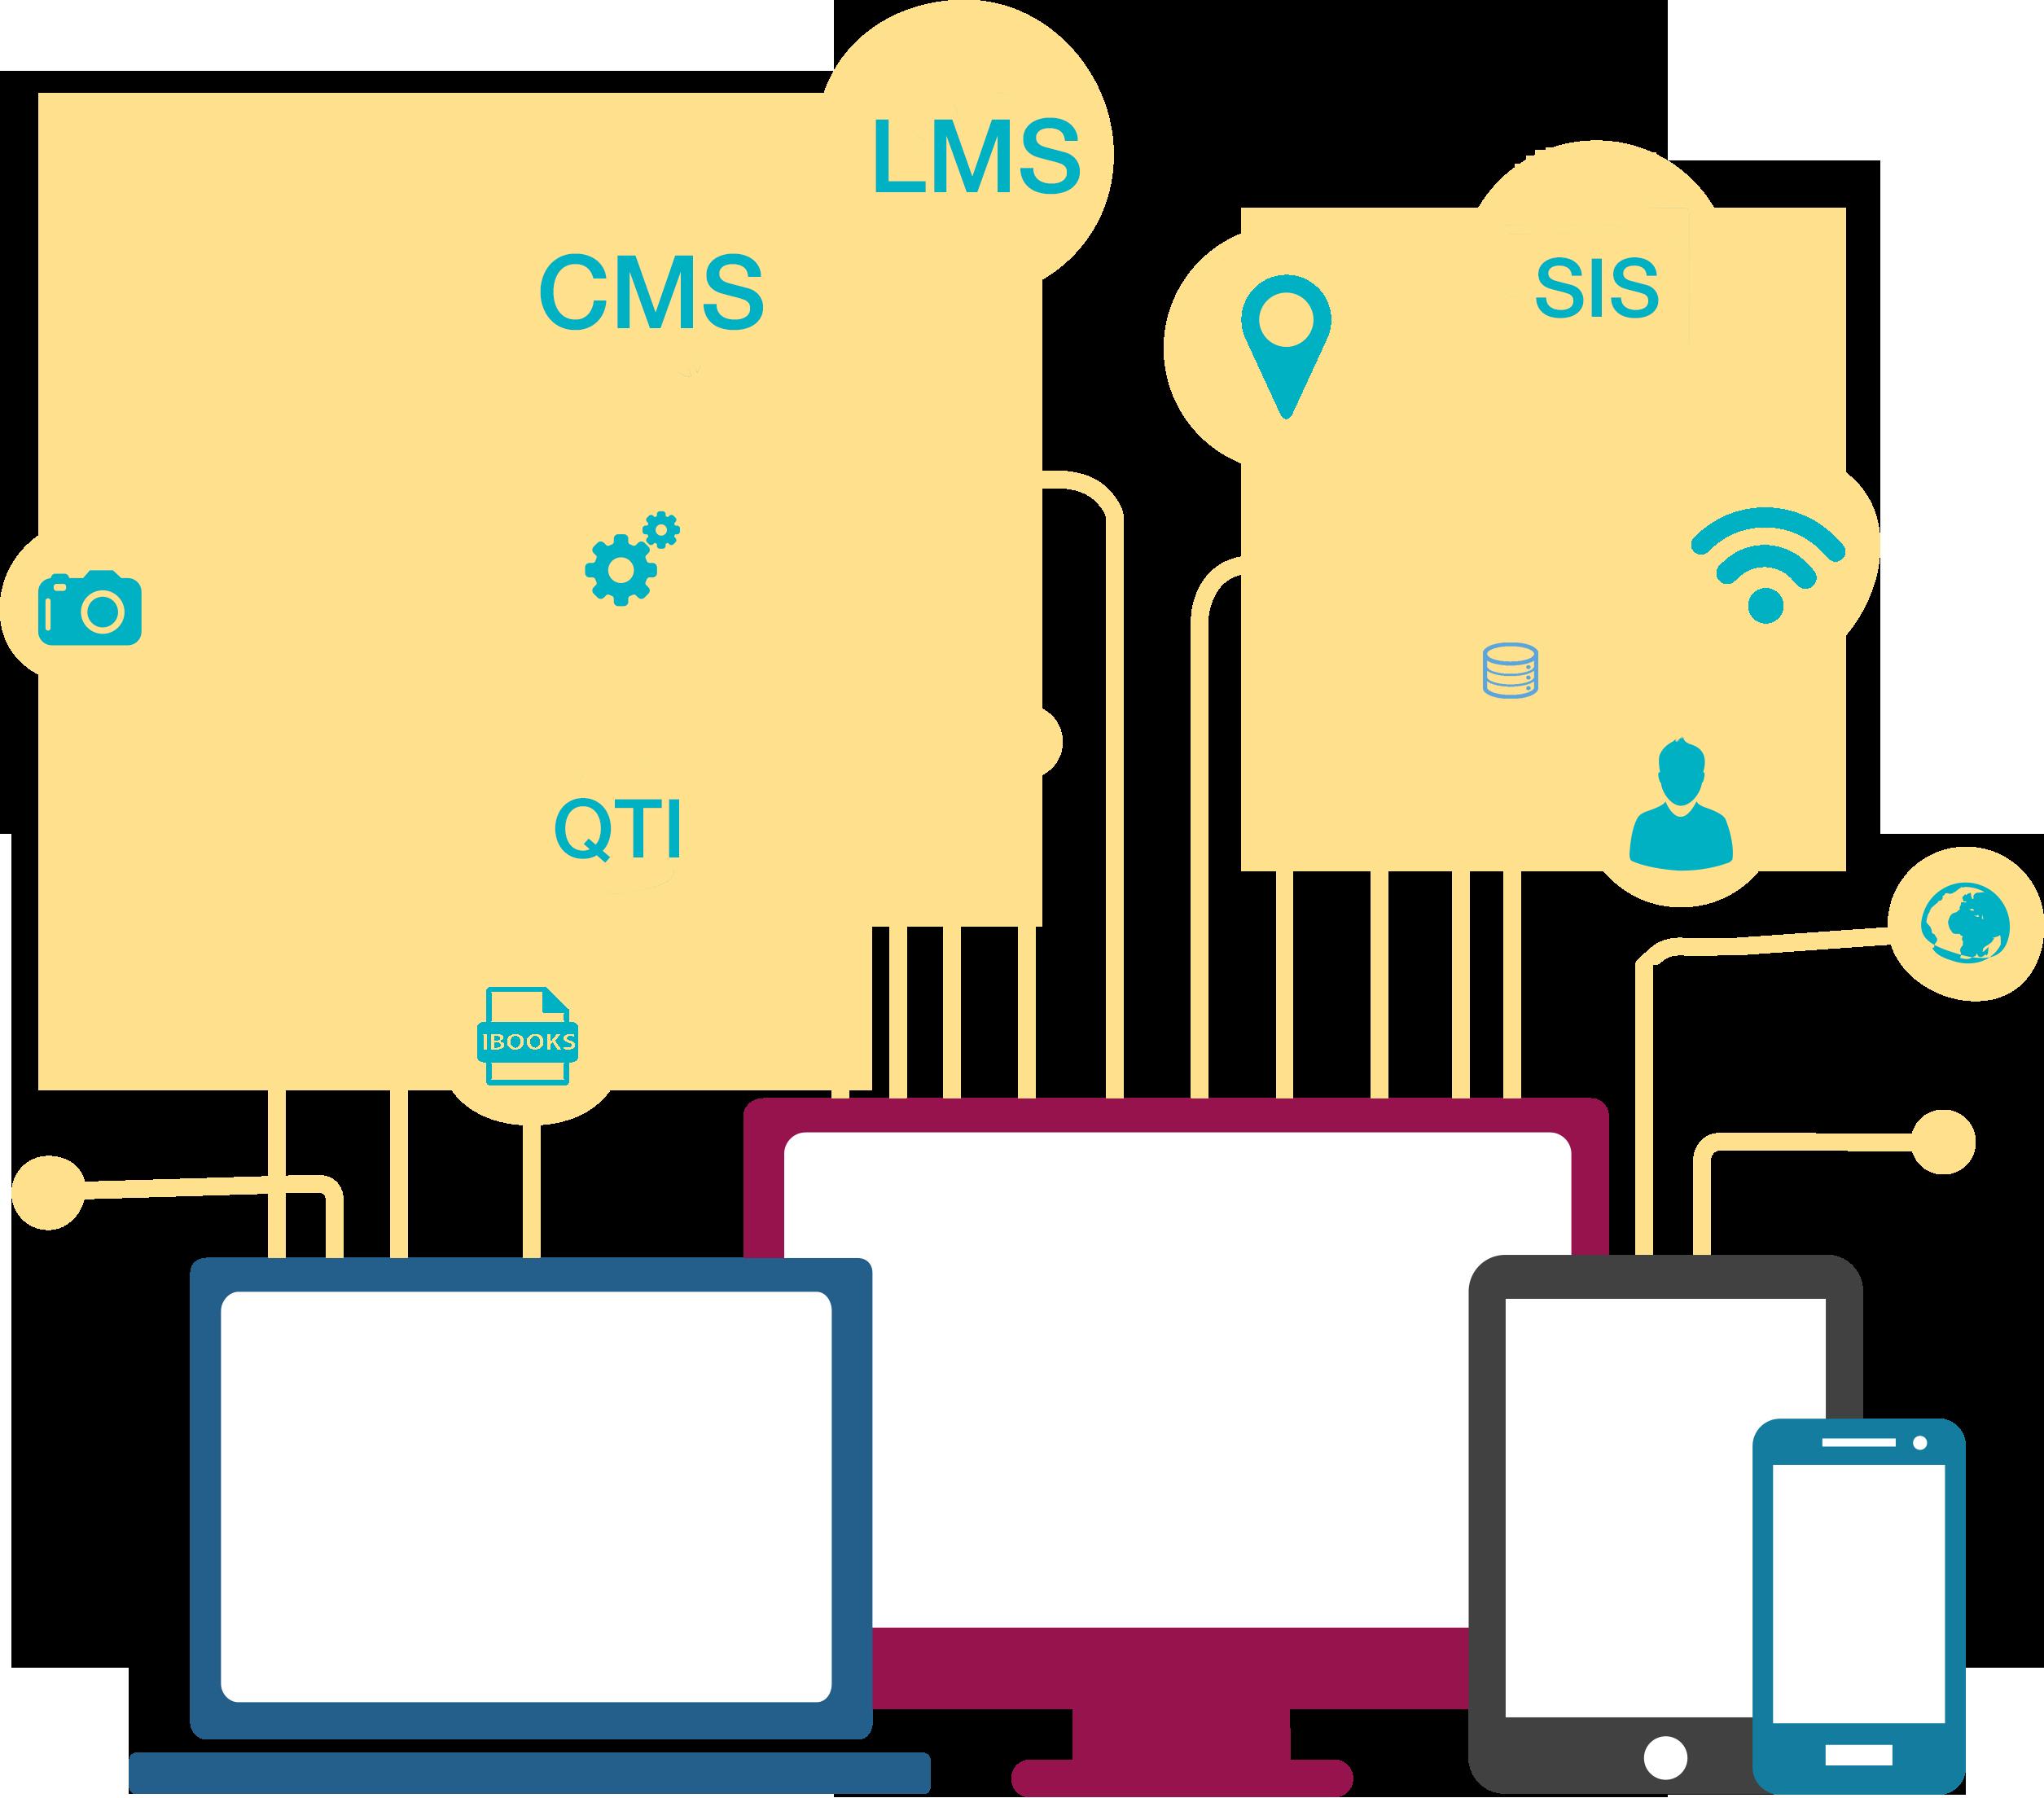 QTI, CMS, LMS, SIS technology web